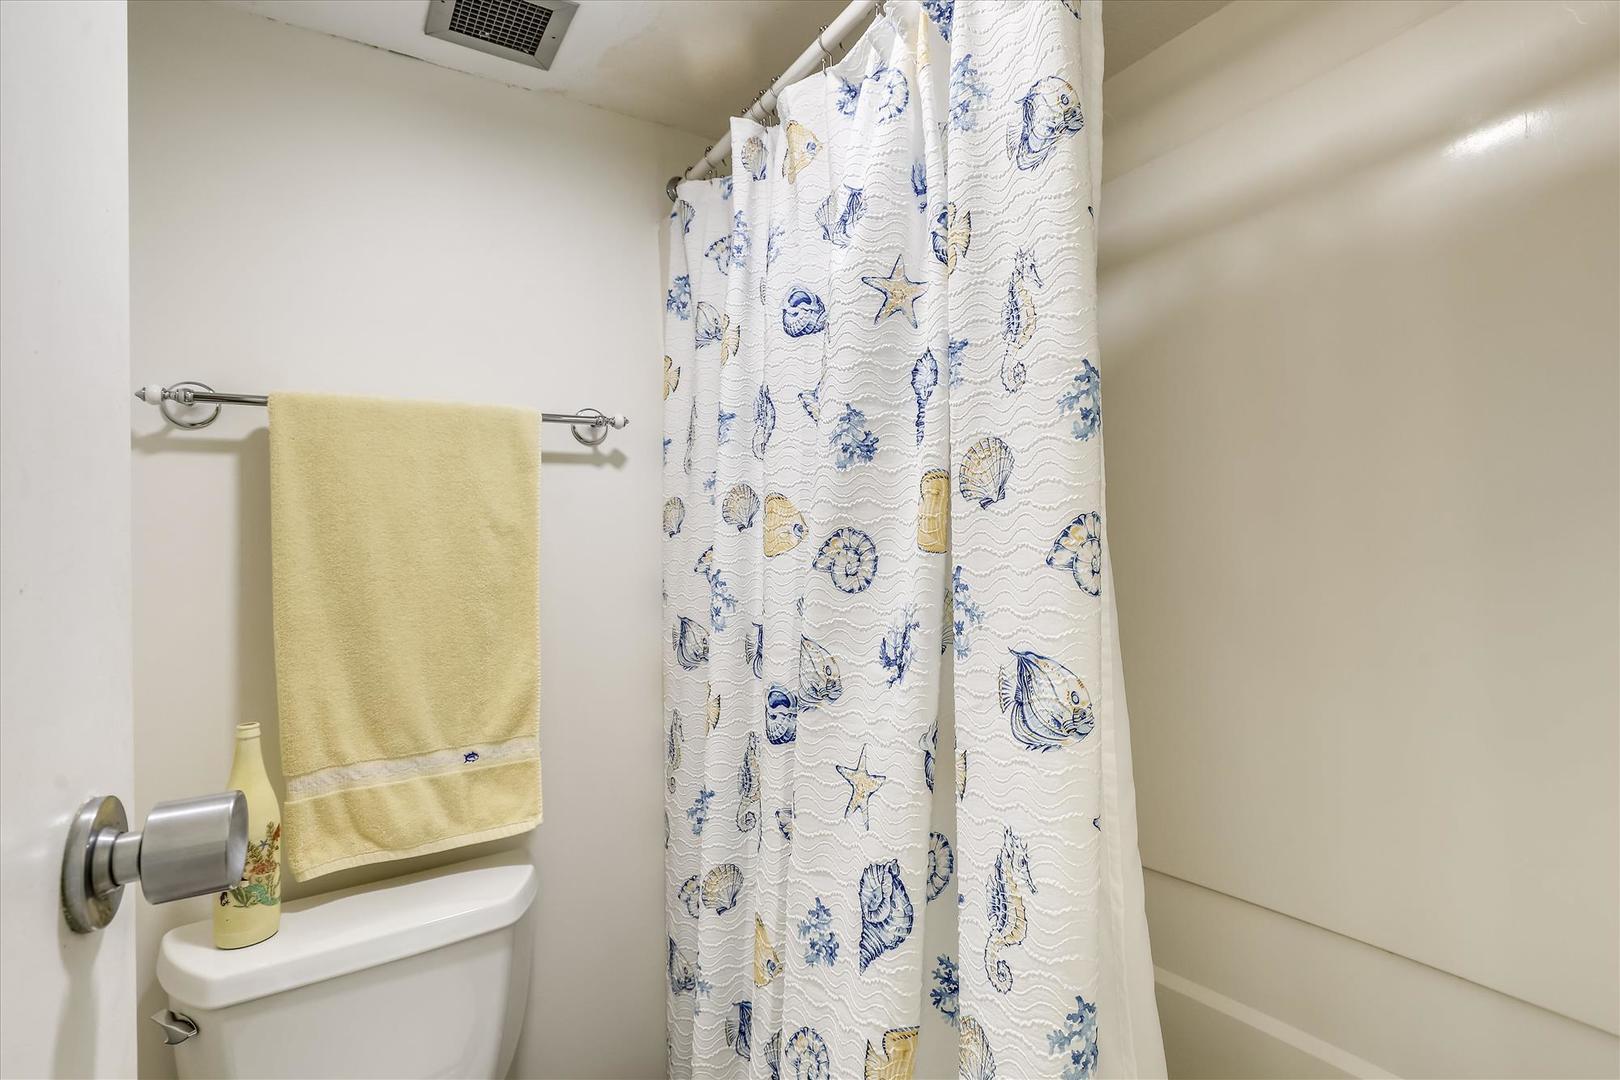 Century I 2203 - Lower Level Bathroom